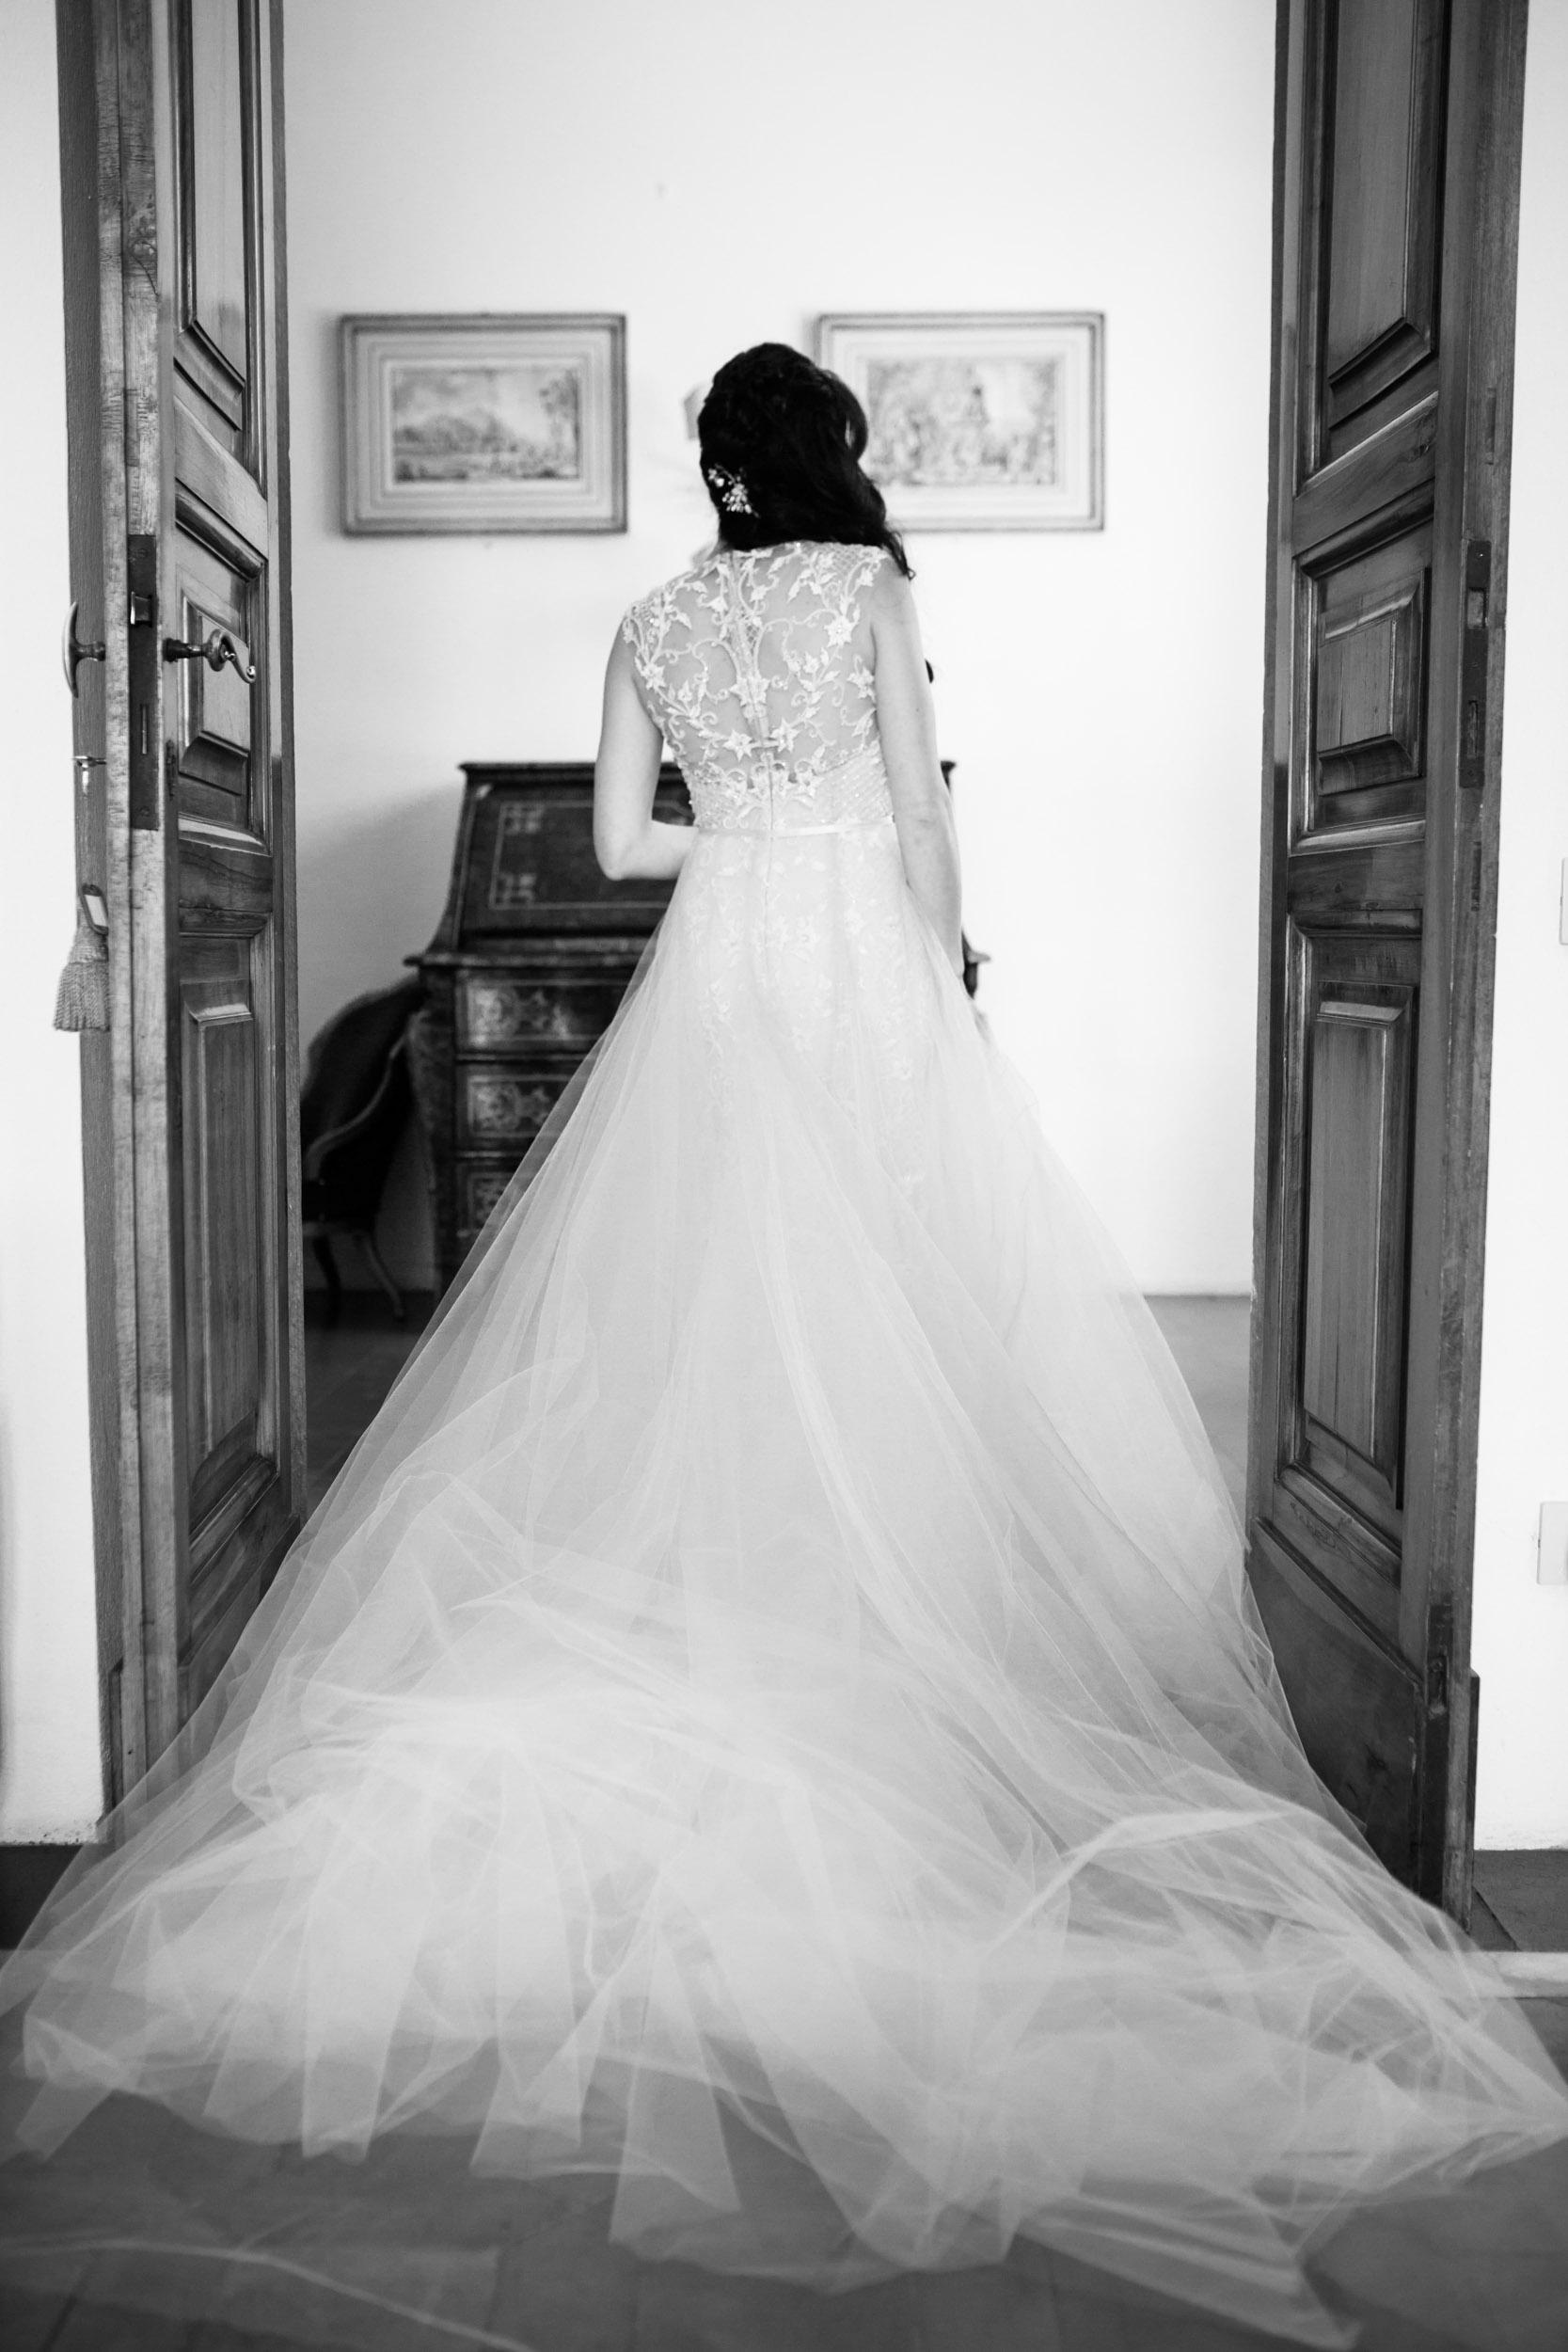 villa-gamberaia-florence-italy-destination-wedding-14.jpg